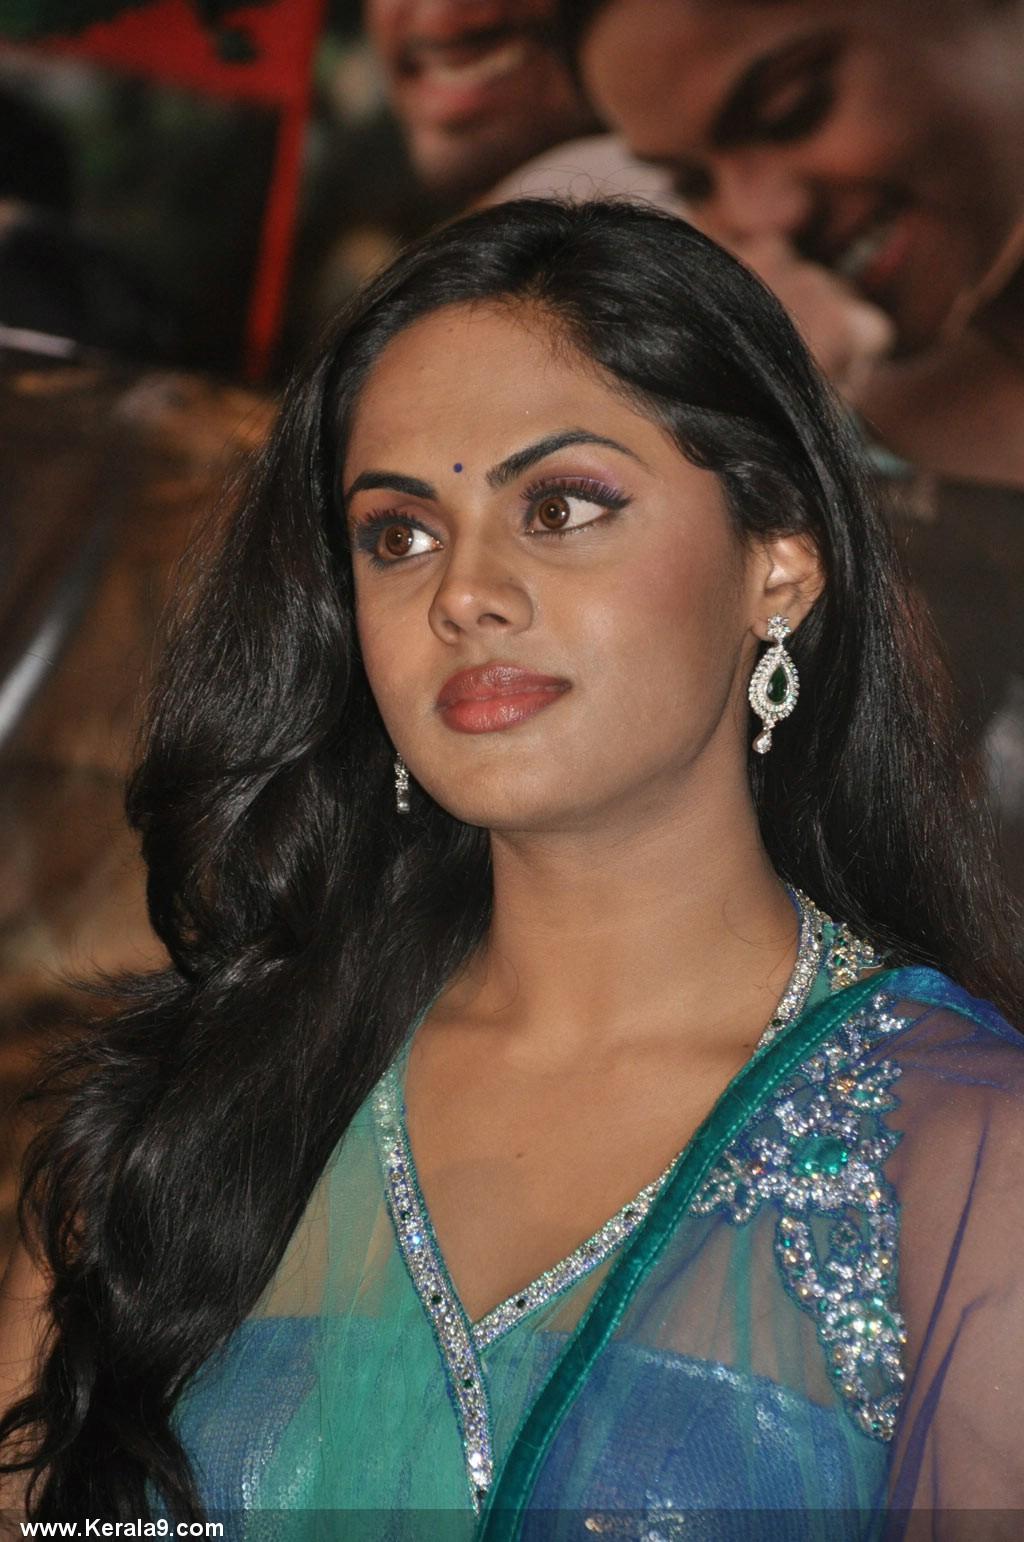 actresses gallery: karthika nair